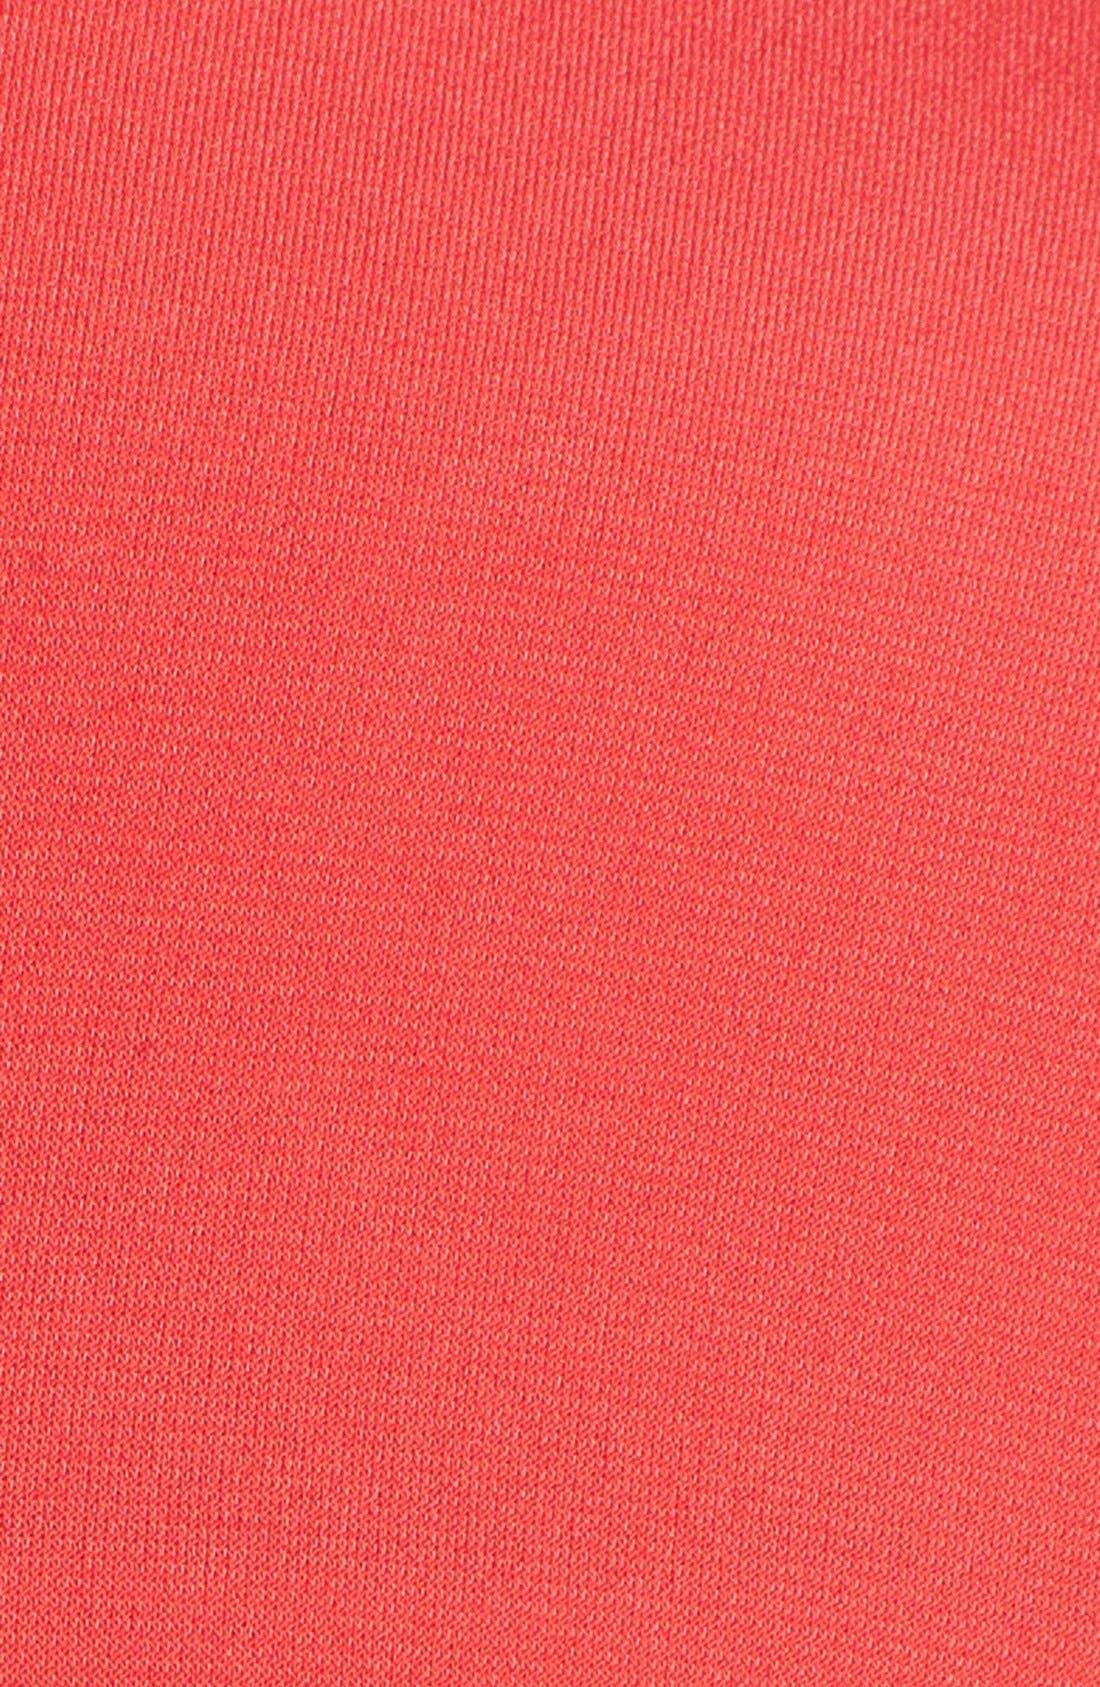 Alternate Image 3  - MICHAEL Michael Kors Chain Lace-Up Shirtdress